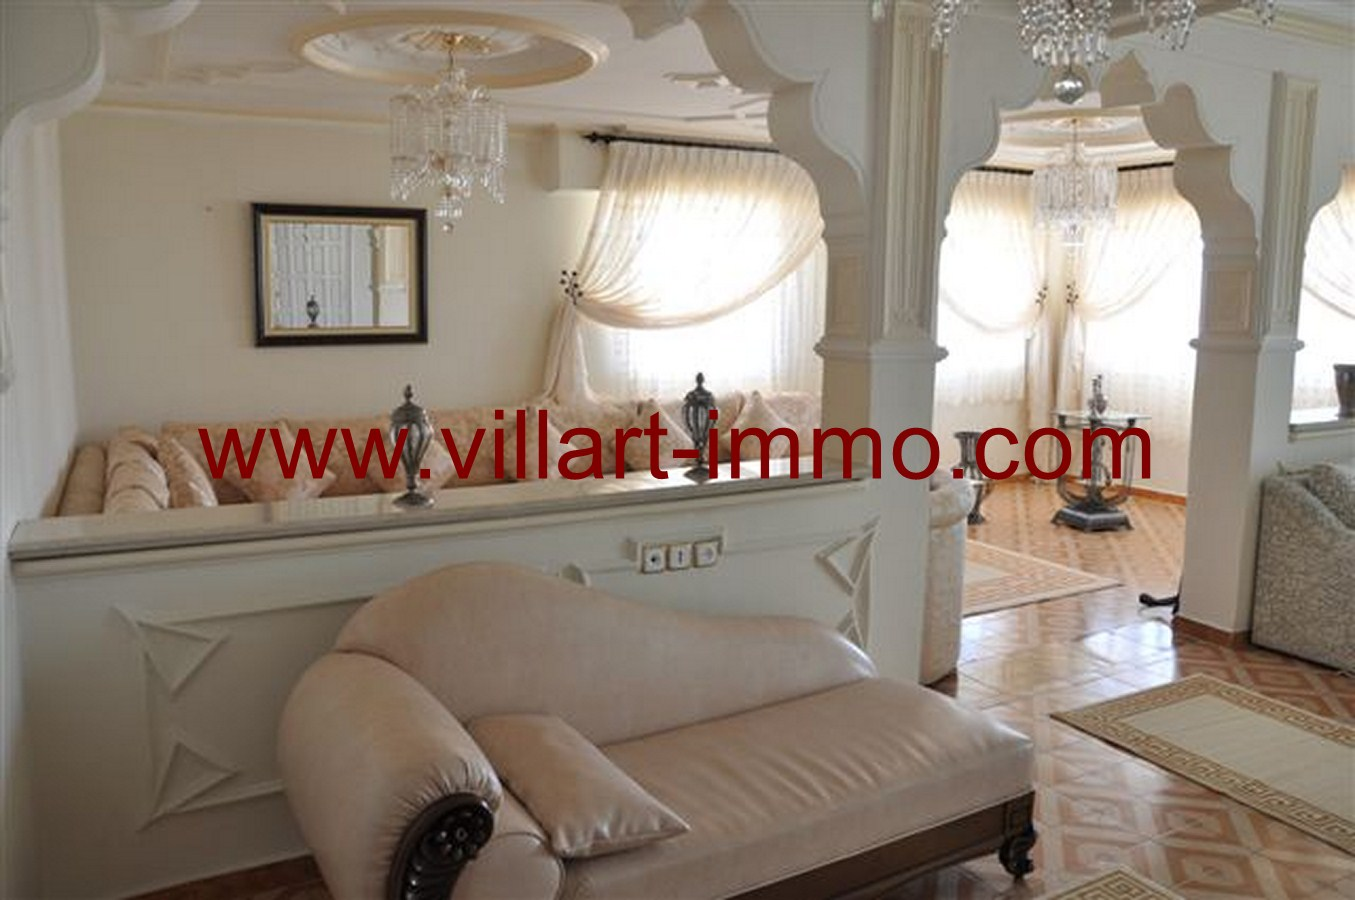 4-Appartement-Meublé-Salon-Tanger-agence immobilière-villartimmo